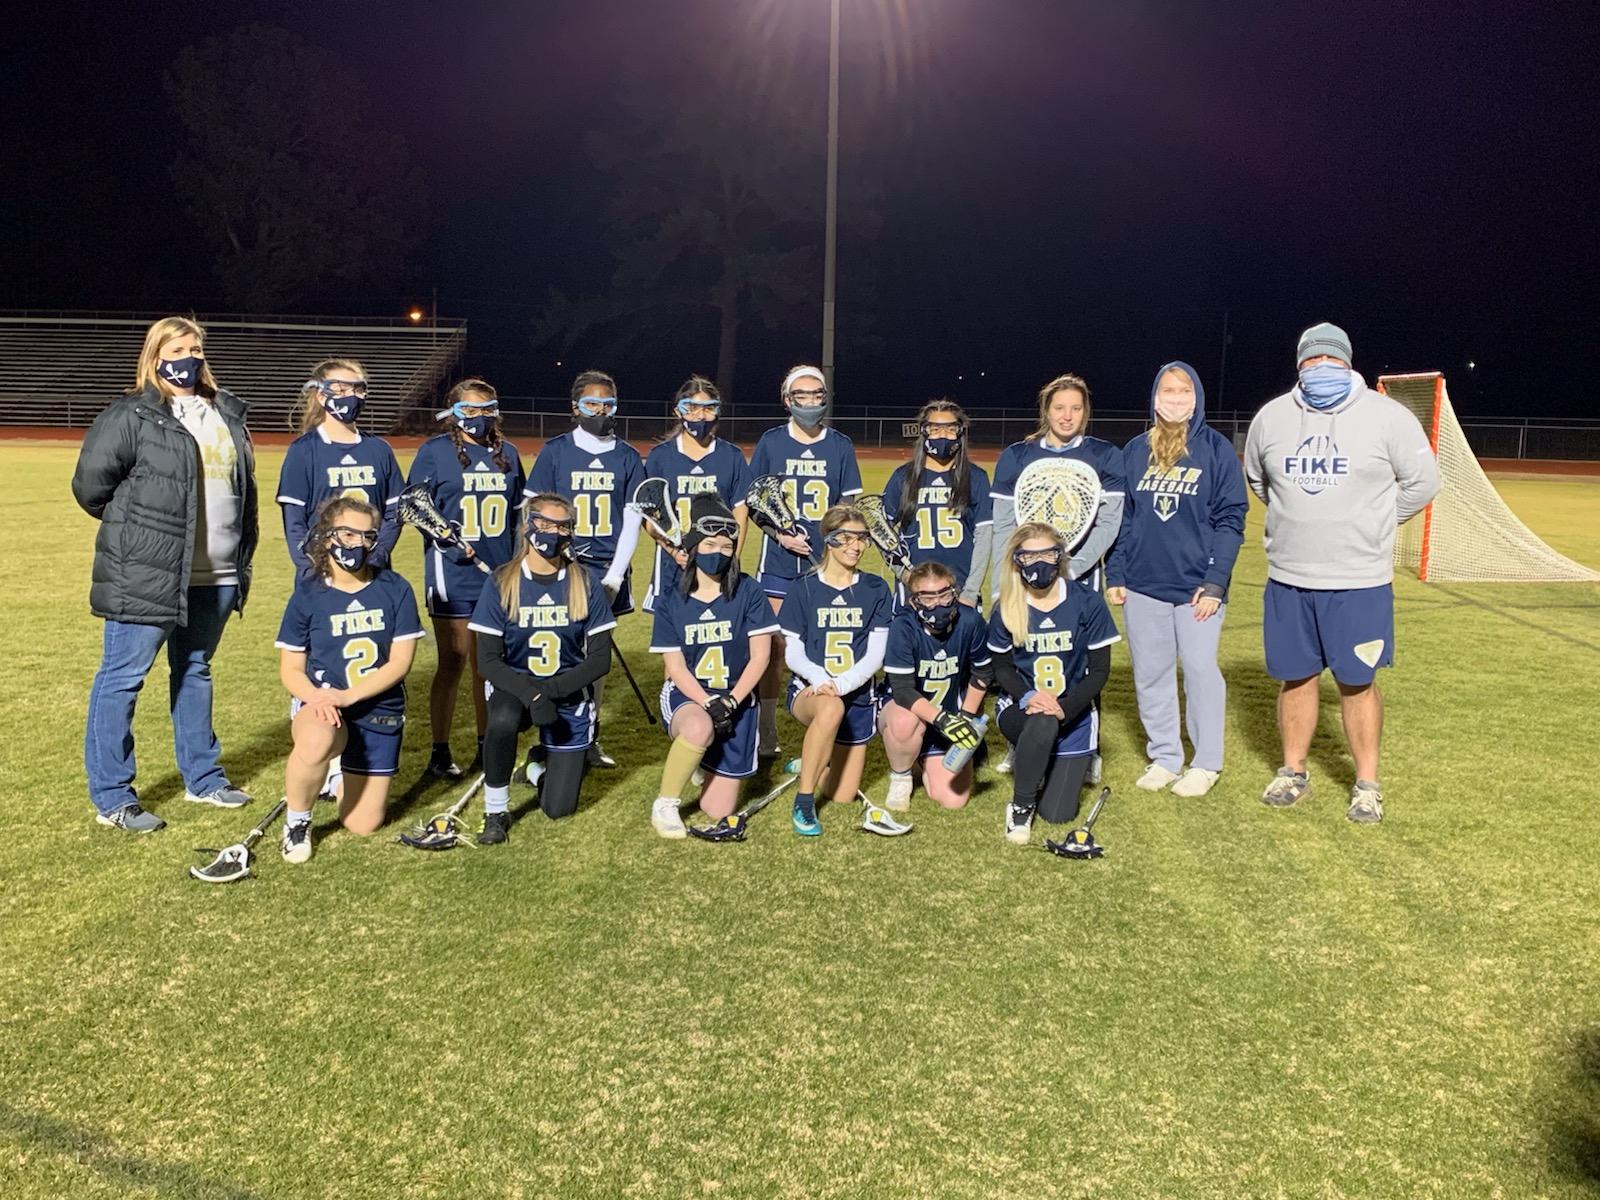 Golden Demons History Made In Inaugural Lacrosse Season